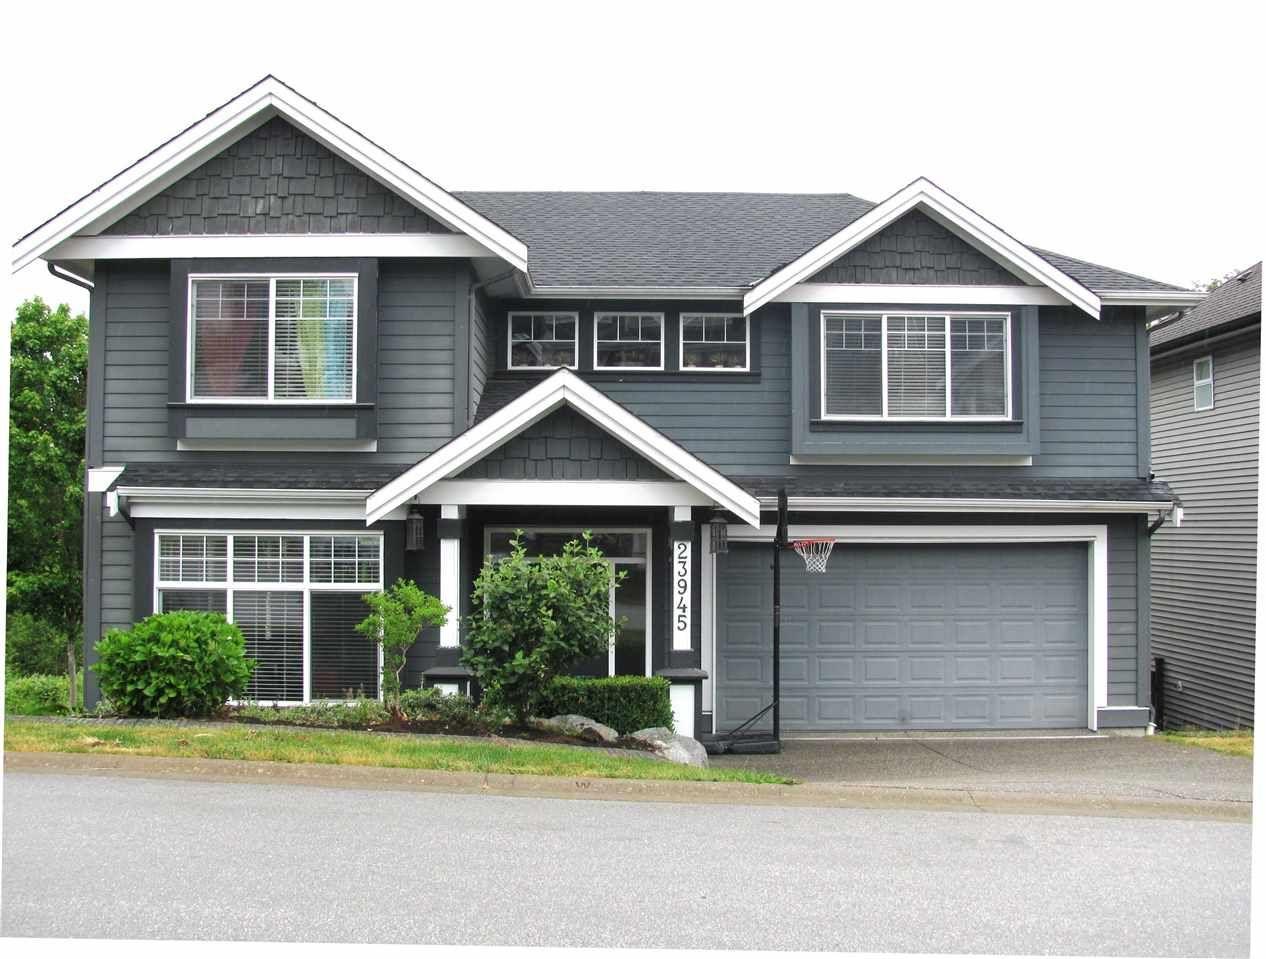 Main Photo: 23945 107 AVENUE in Maple Ridge: Albion House for sale : MLS®# R2070294